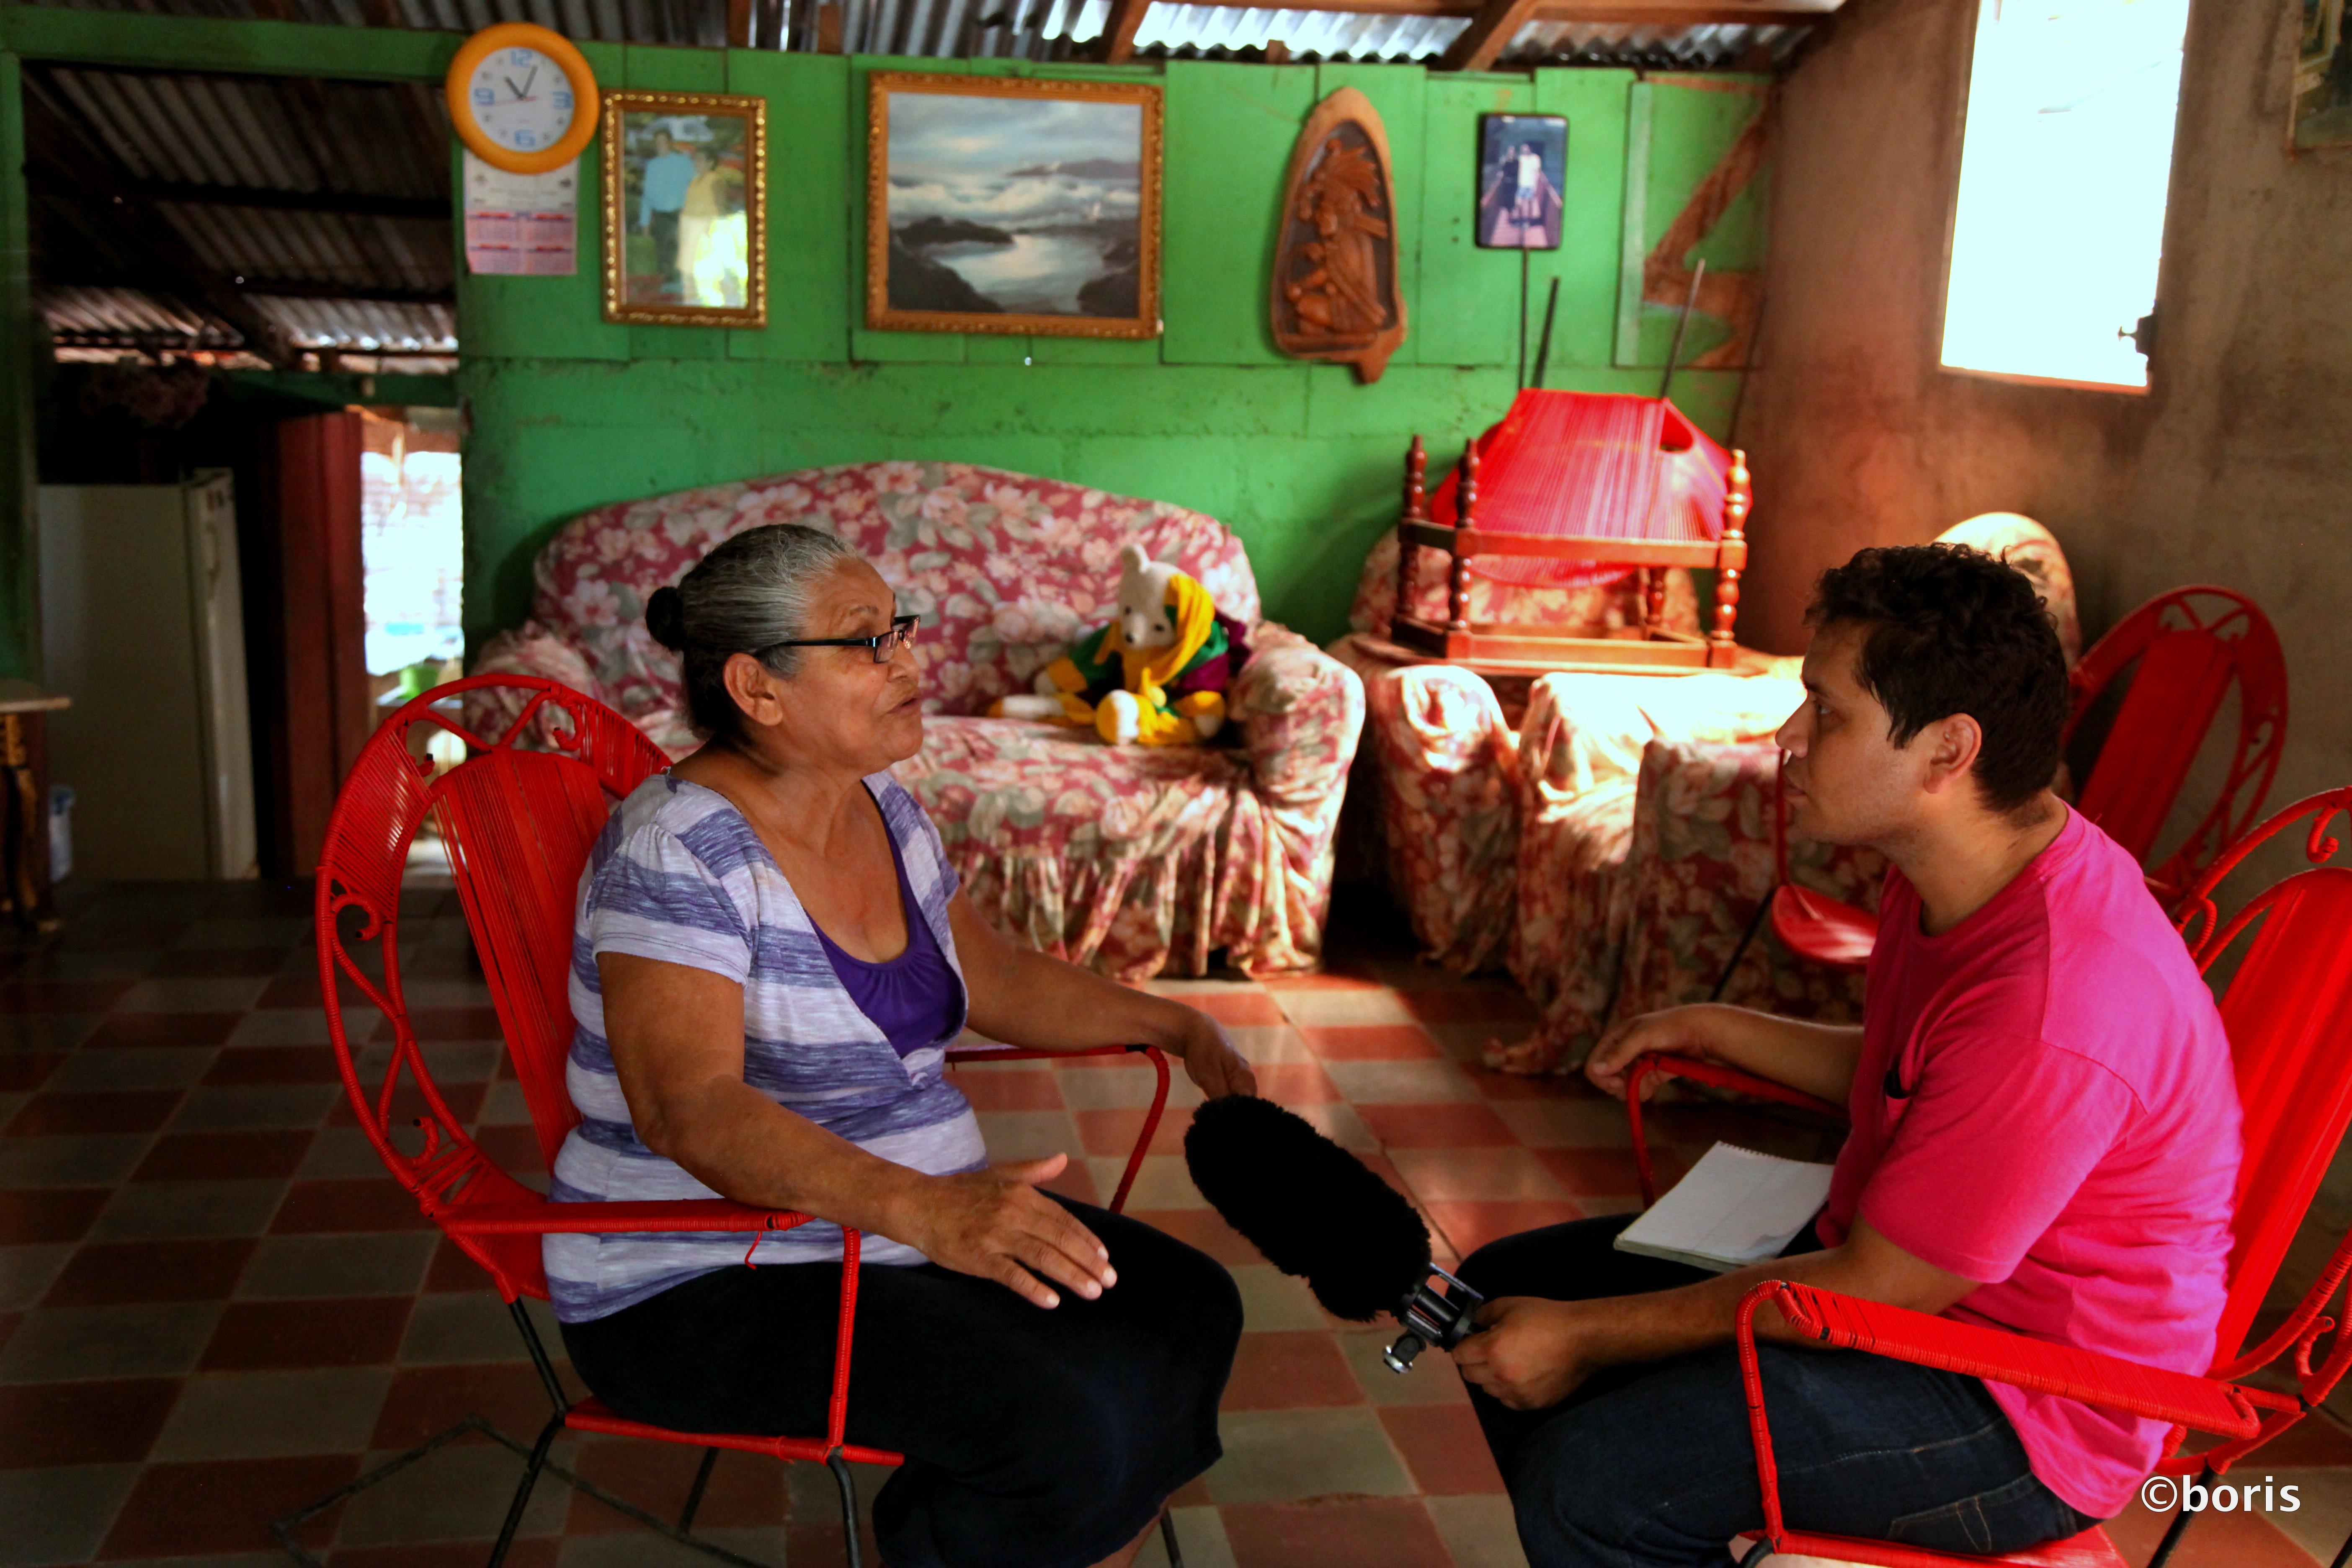 Christopher Mendoza haastattelee vanhempaa naista